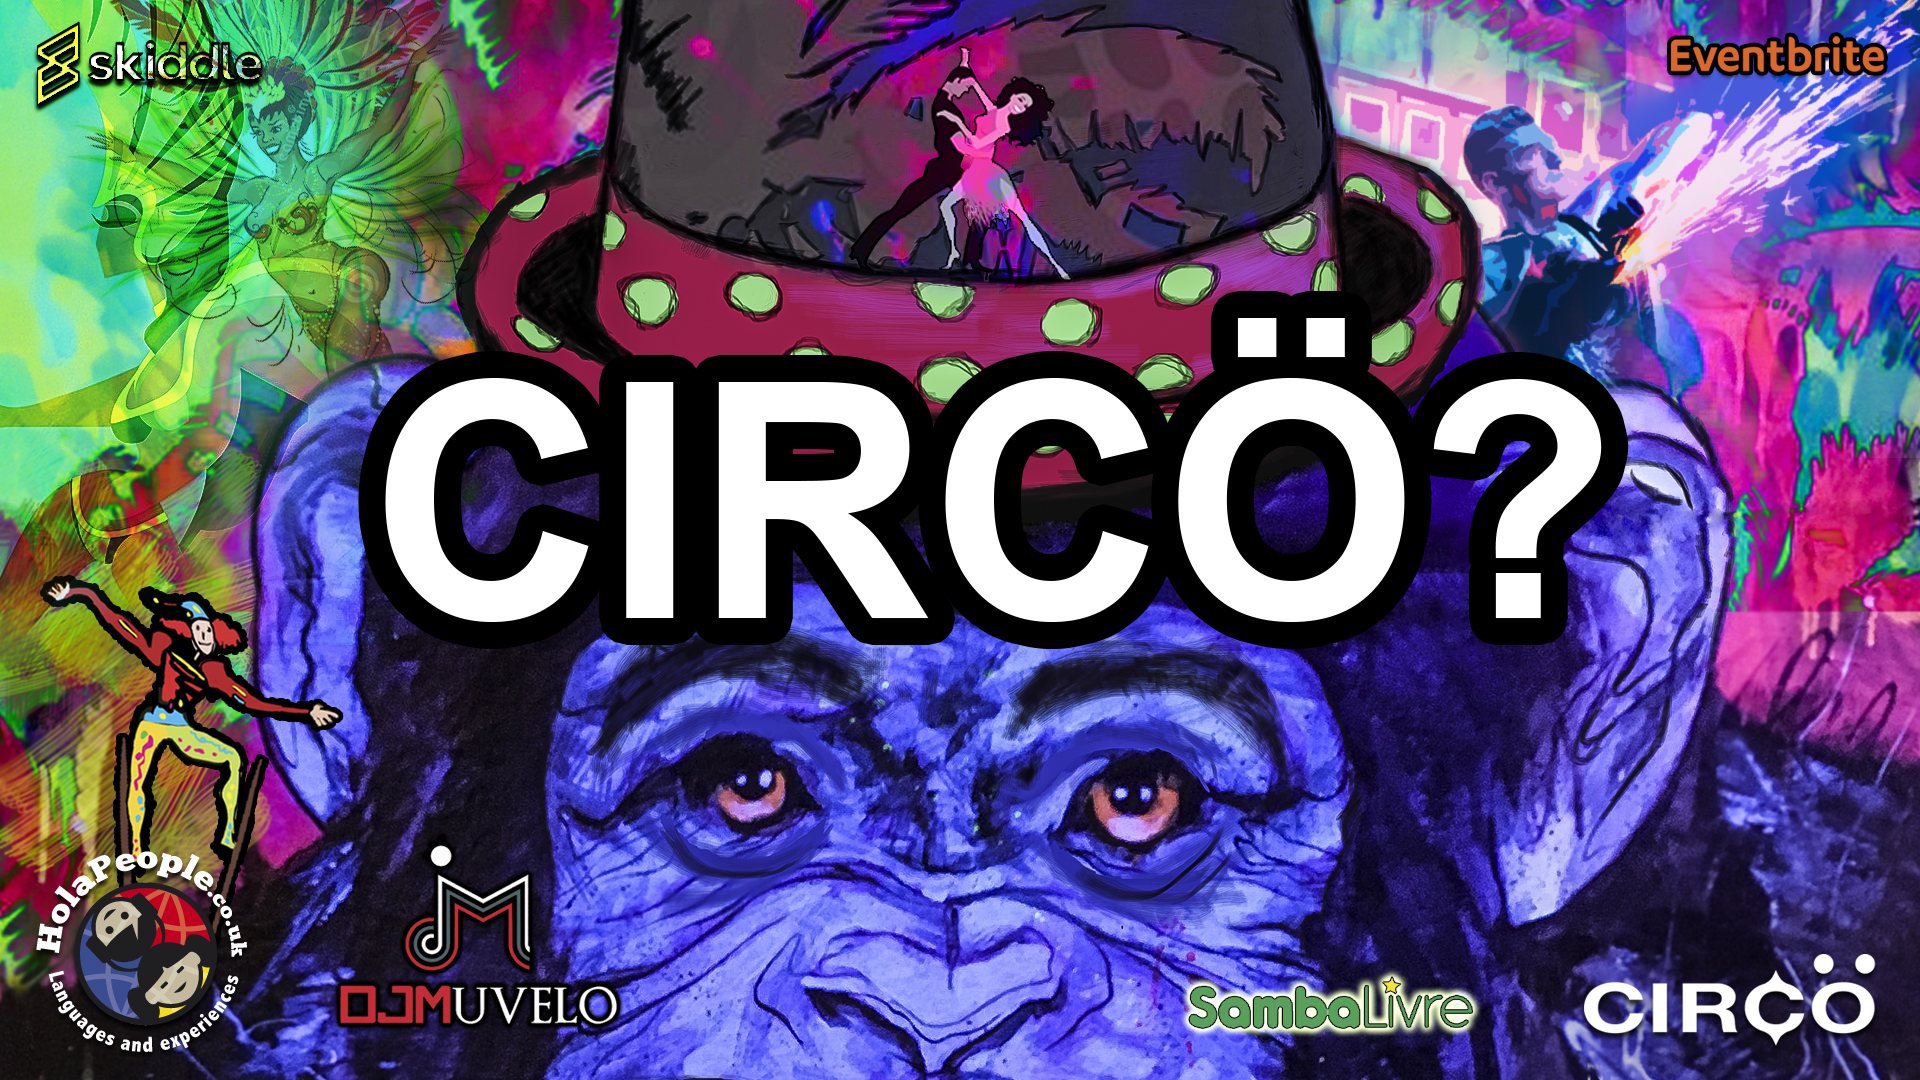 Liverpool Grand party Circo